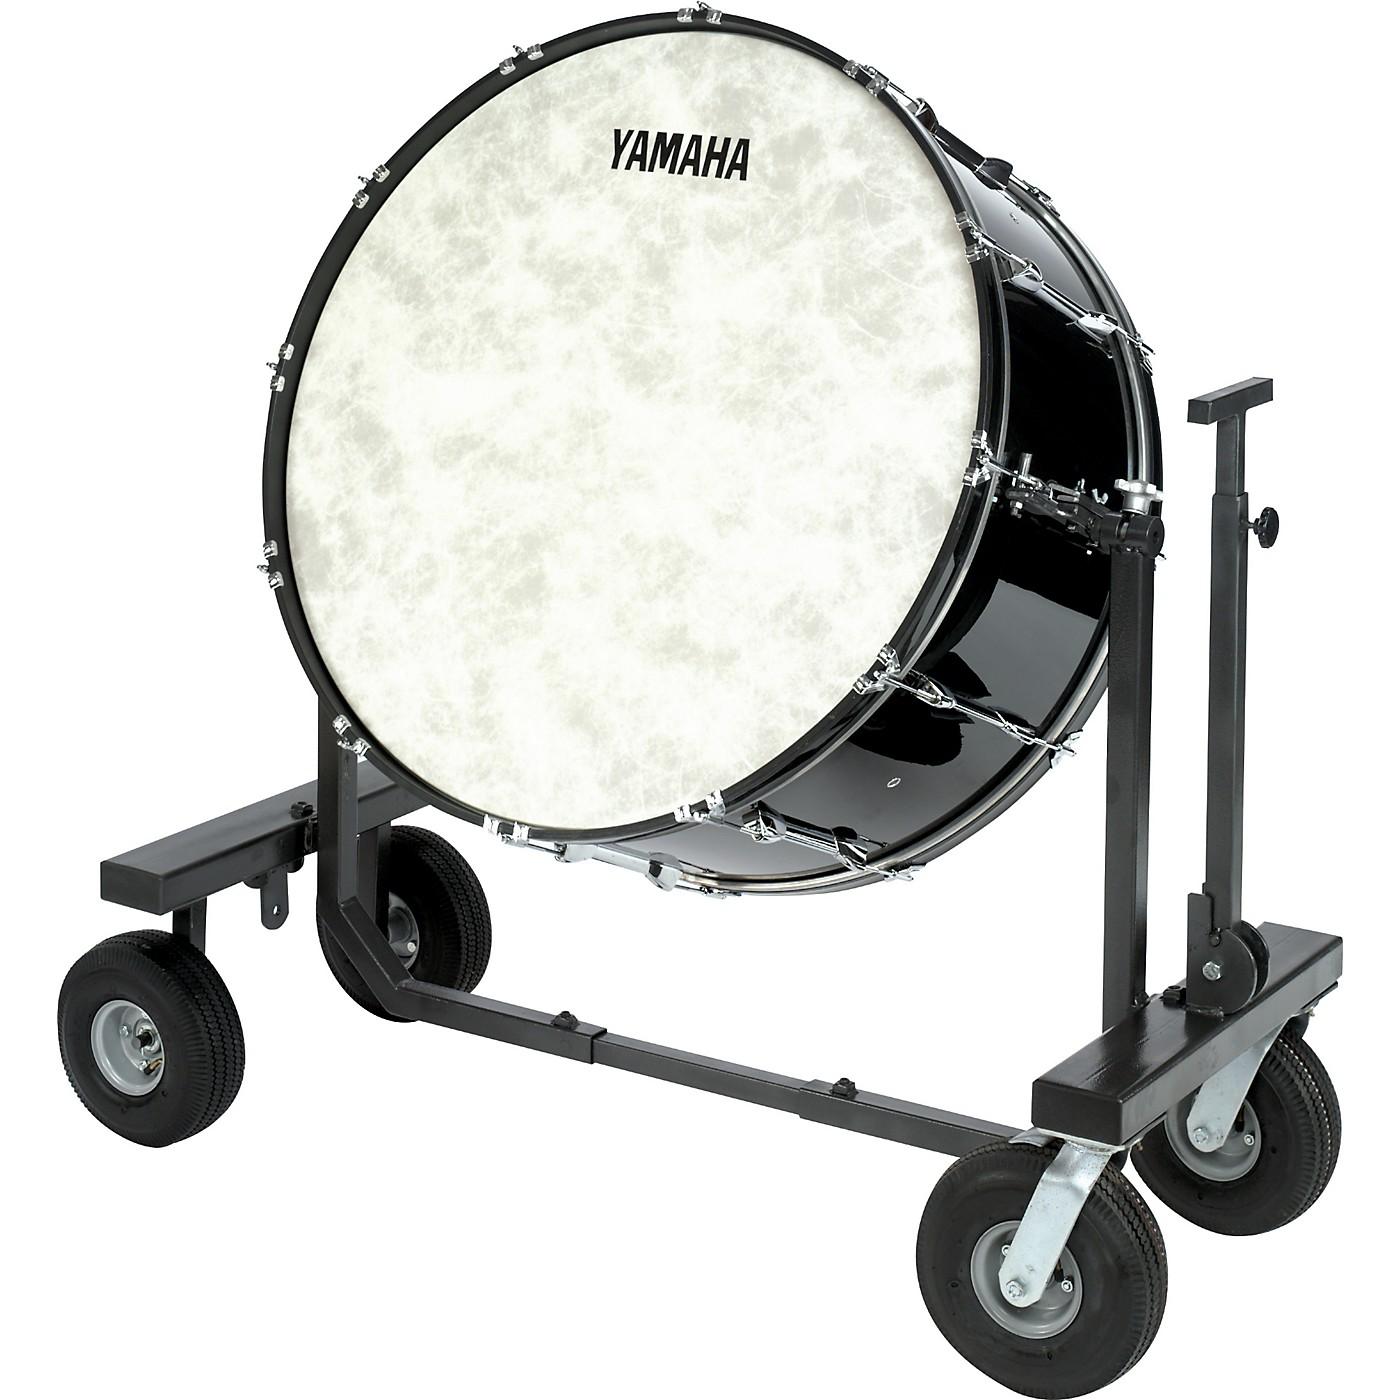 Yamaha Tough Terrain stand for bass drum thumbnail